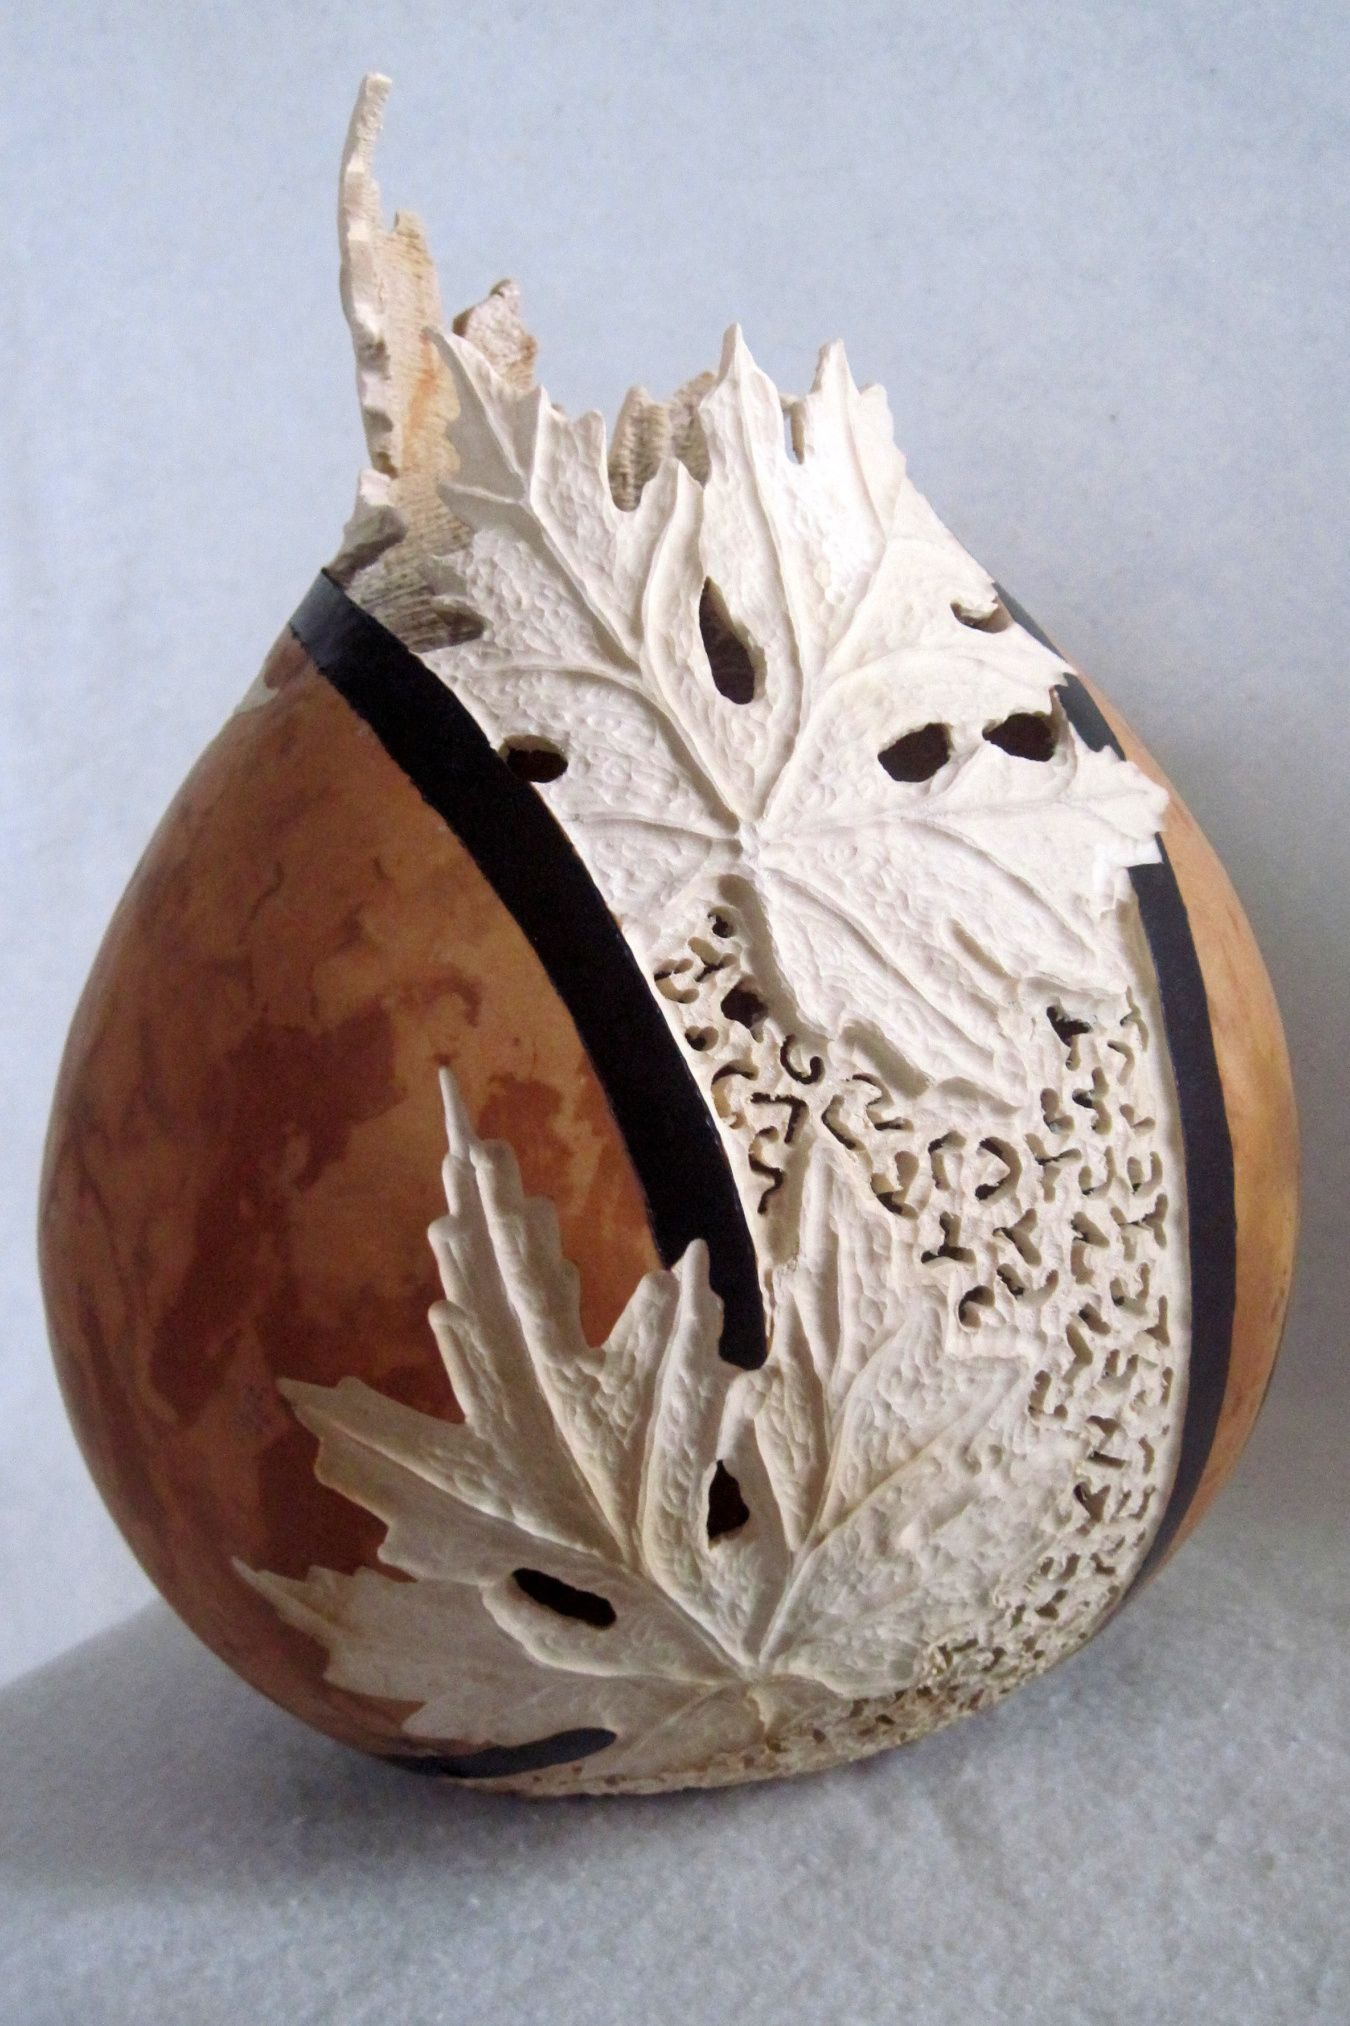 Gourd art by joanna helphrey … pinteres…